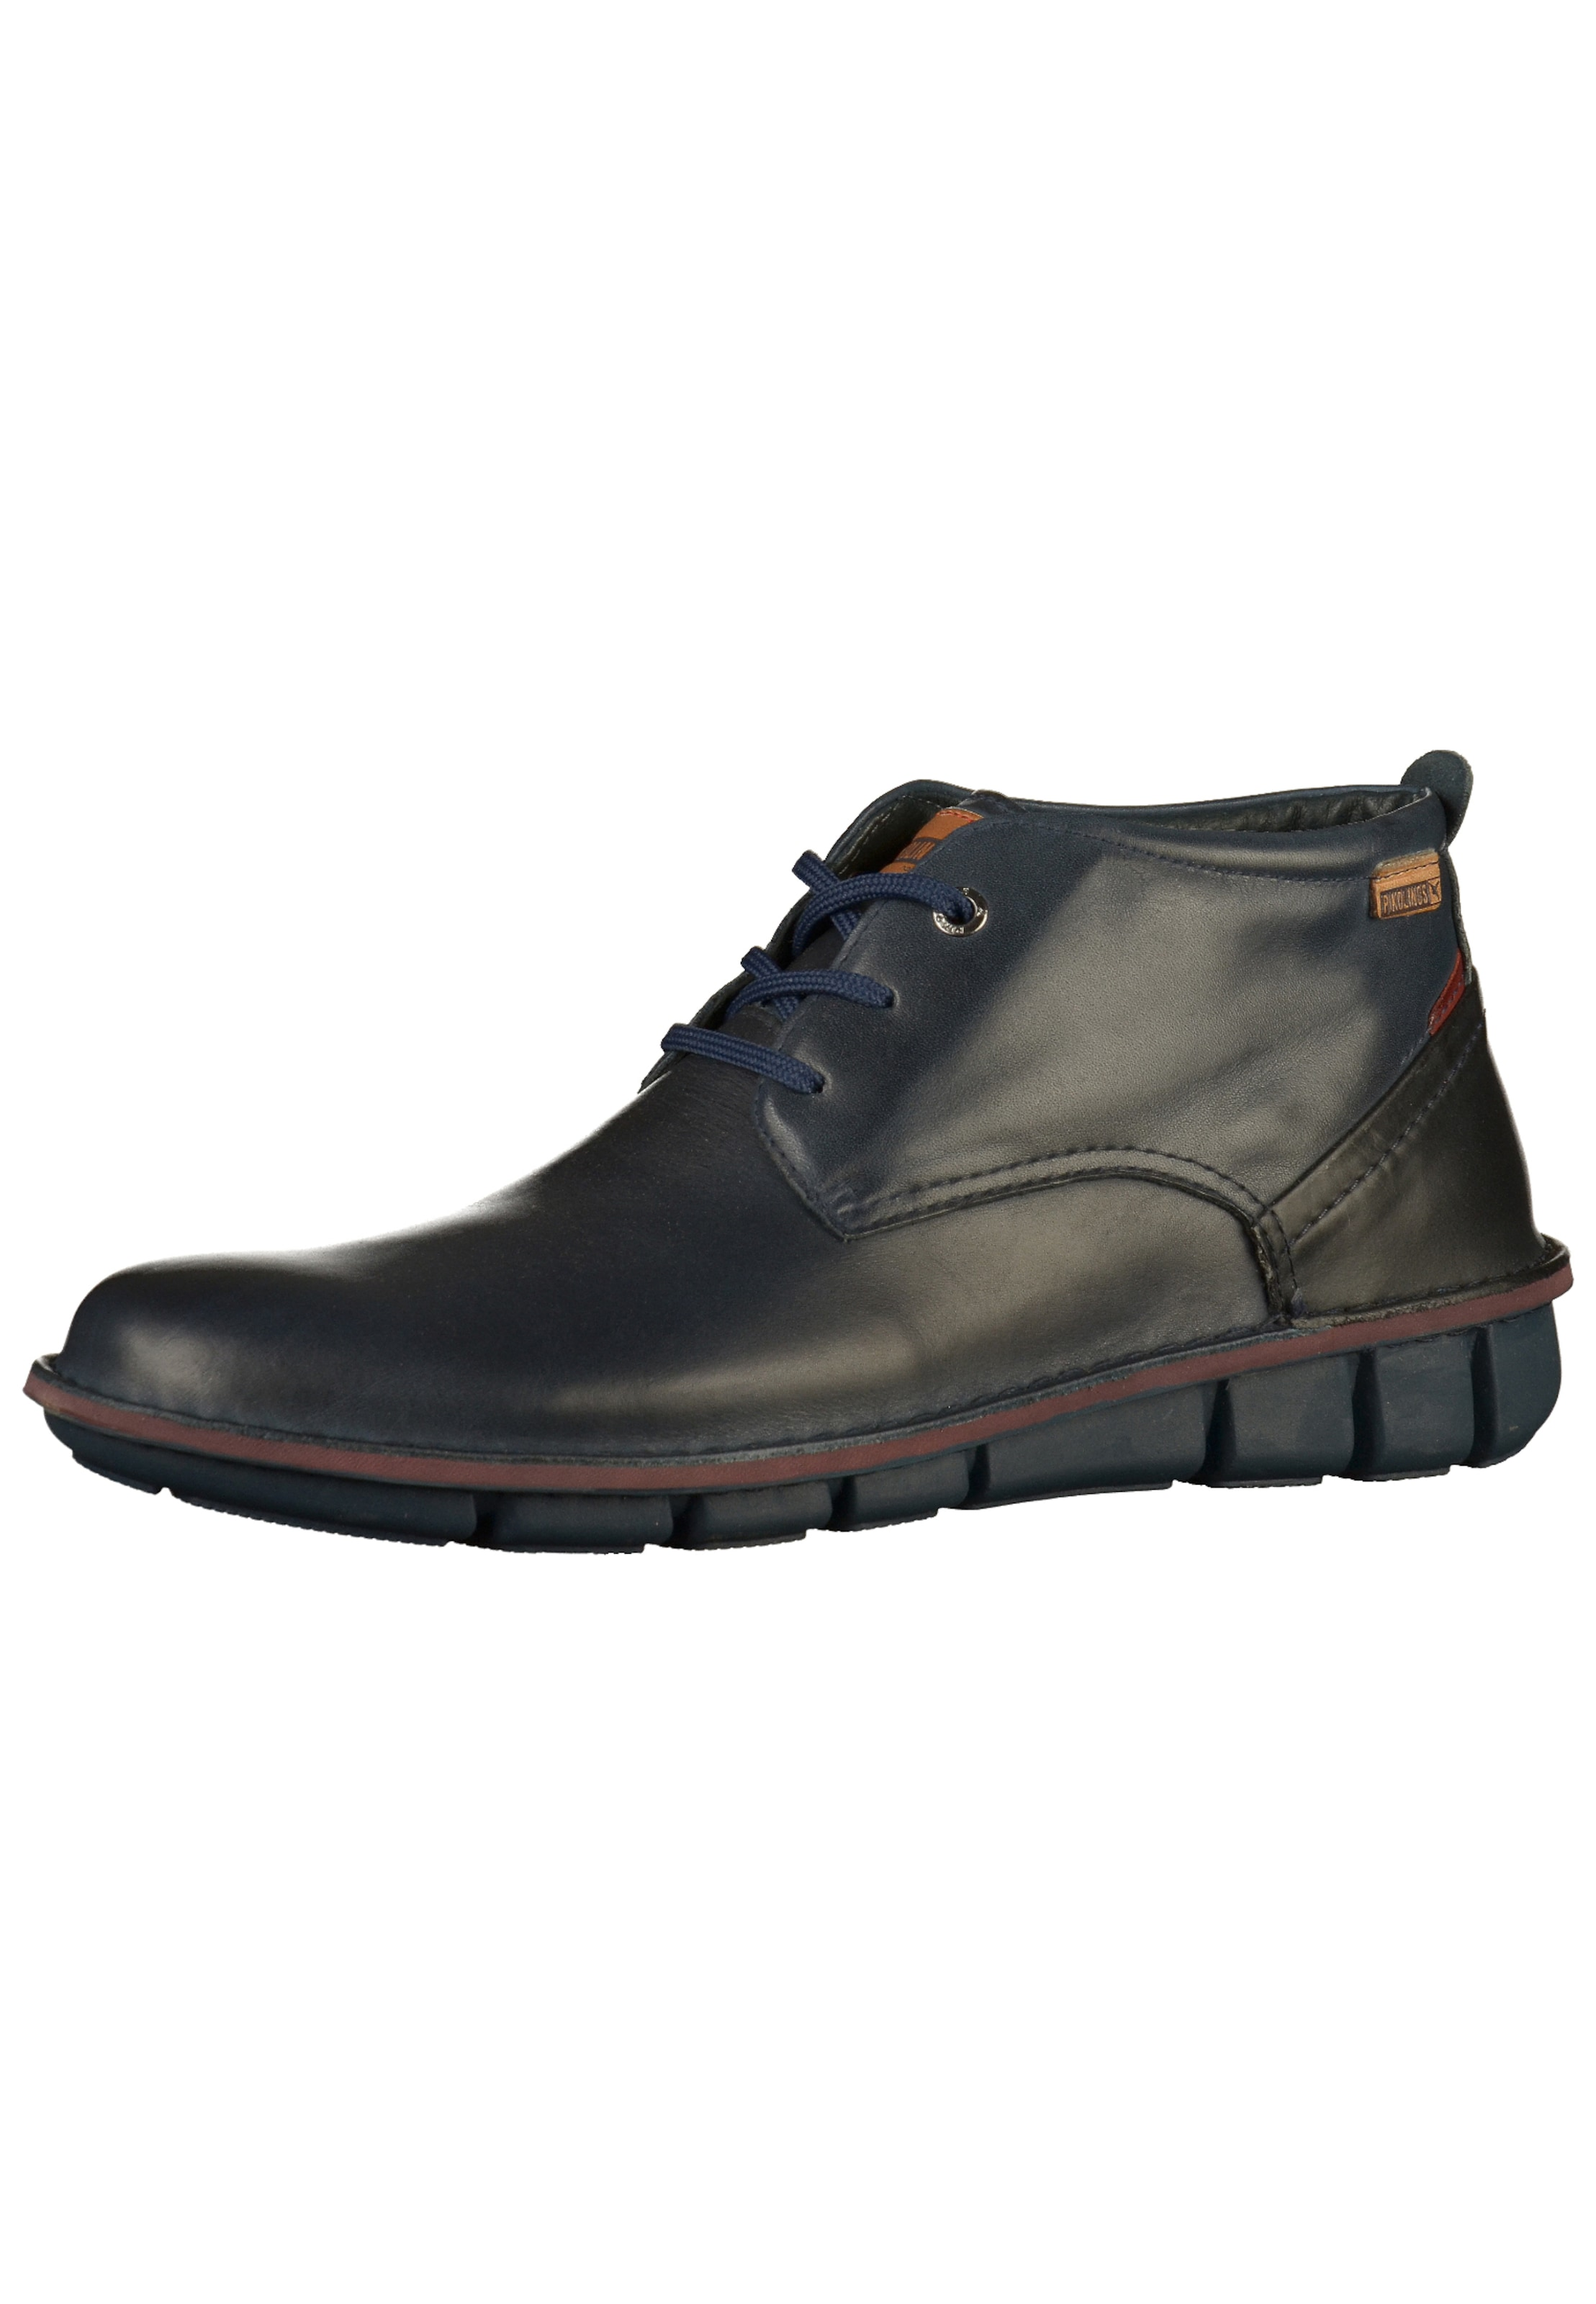 Pikolinos Schuhe Nachtblau In Schuhe Schuhe Pikolinos In Pikolinos In Nachtblau TFc5lJu3K1